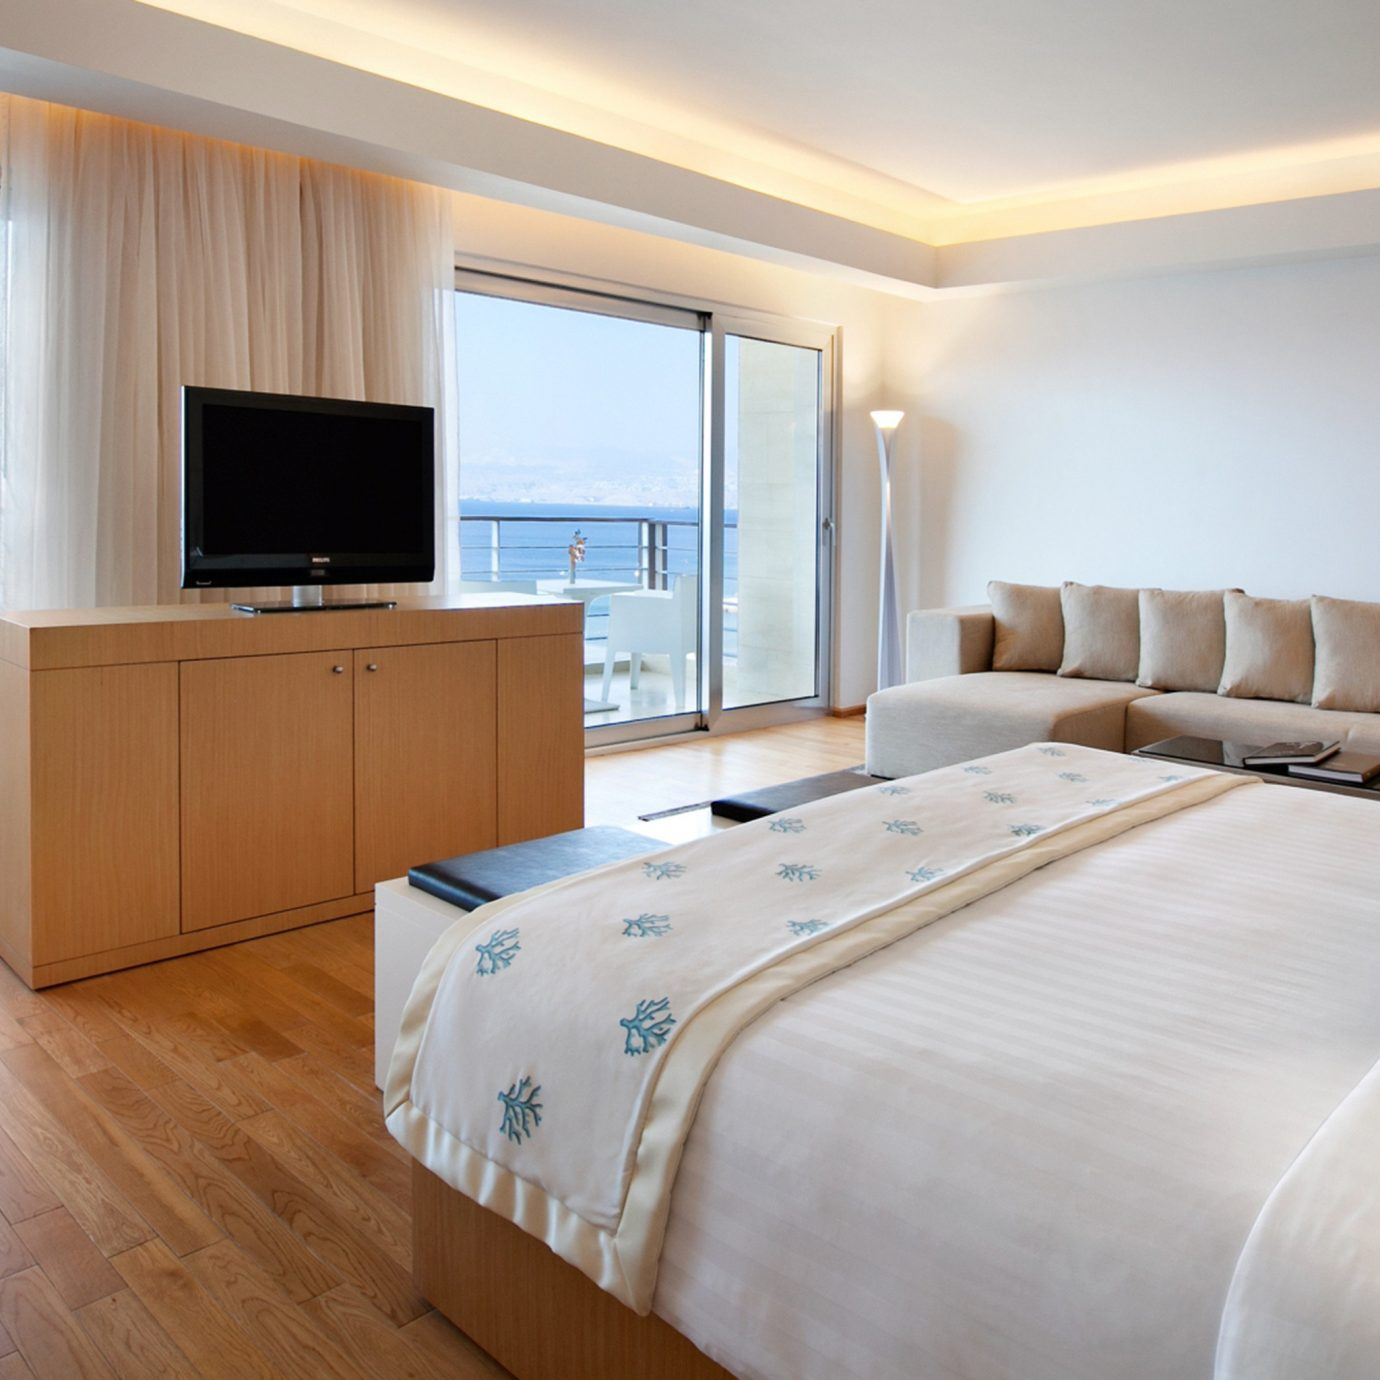 Balcony Beachfront Bedroom Luxury Resort Romantic Scenic views Sea property Suite cottage Modern